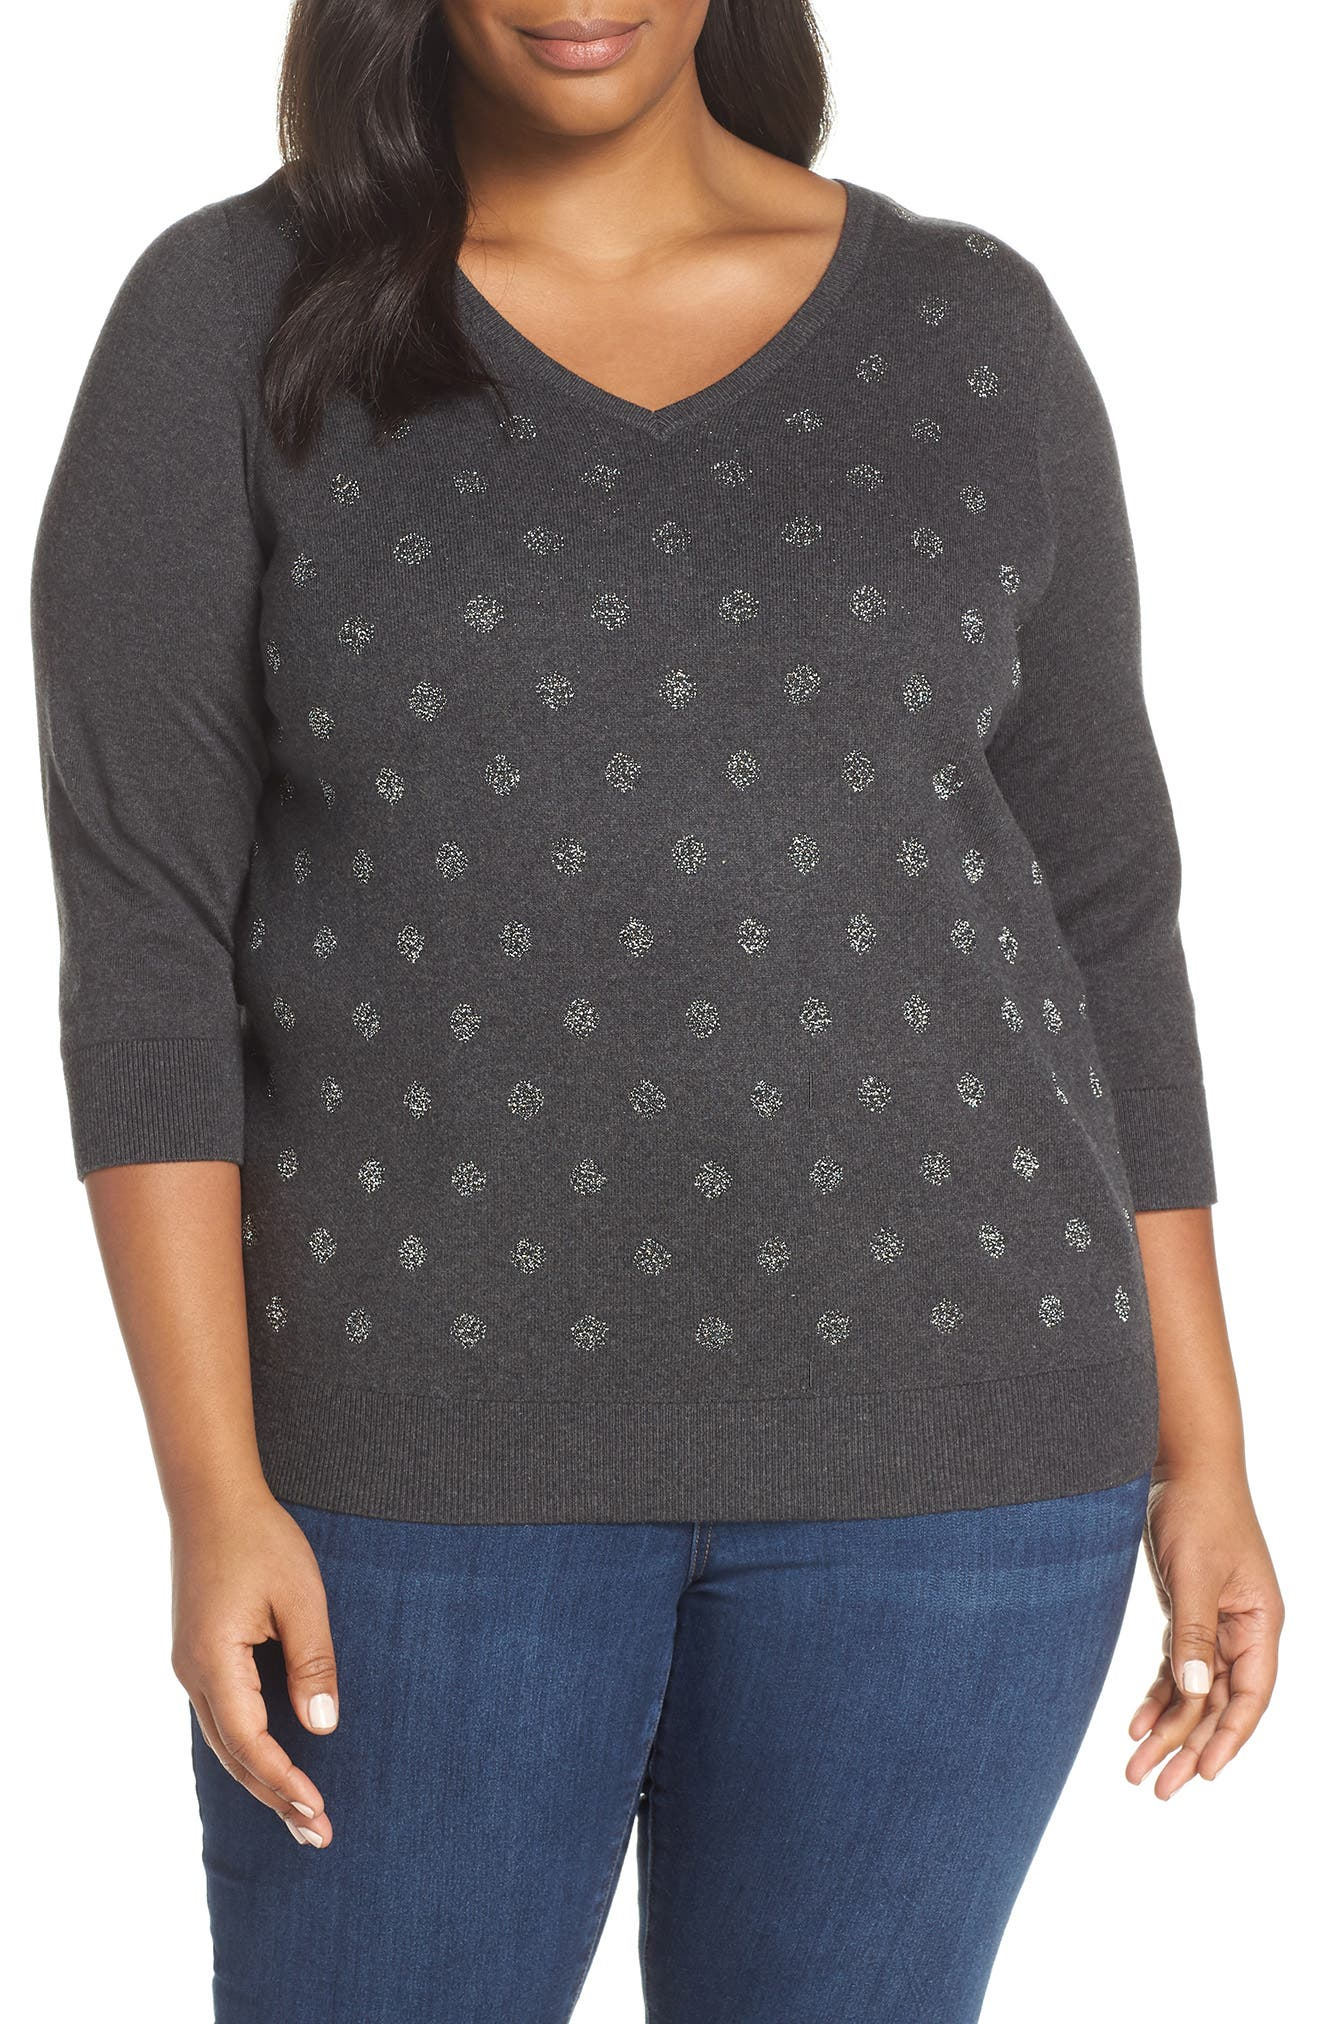 Metalic Dot Pullover,                         Main,                         color, GREY DARK CHARCOAL HEATHER